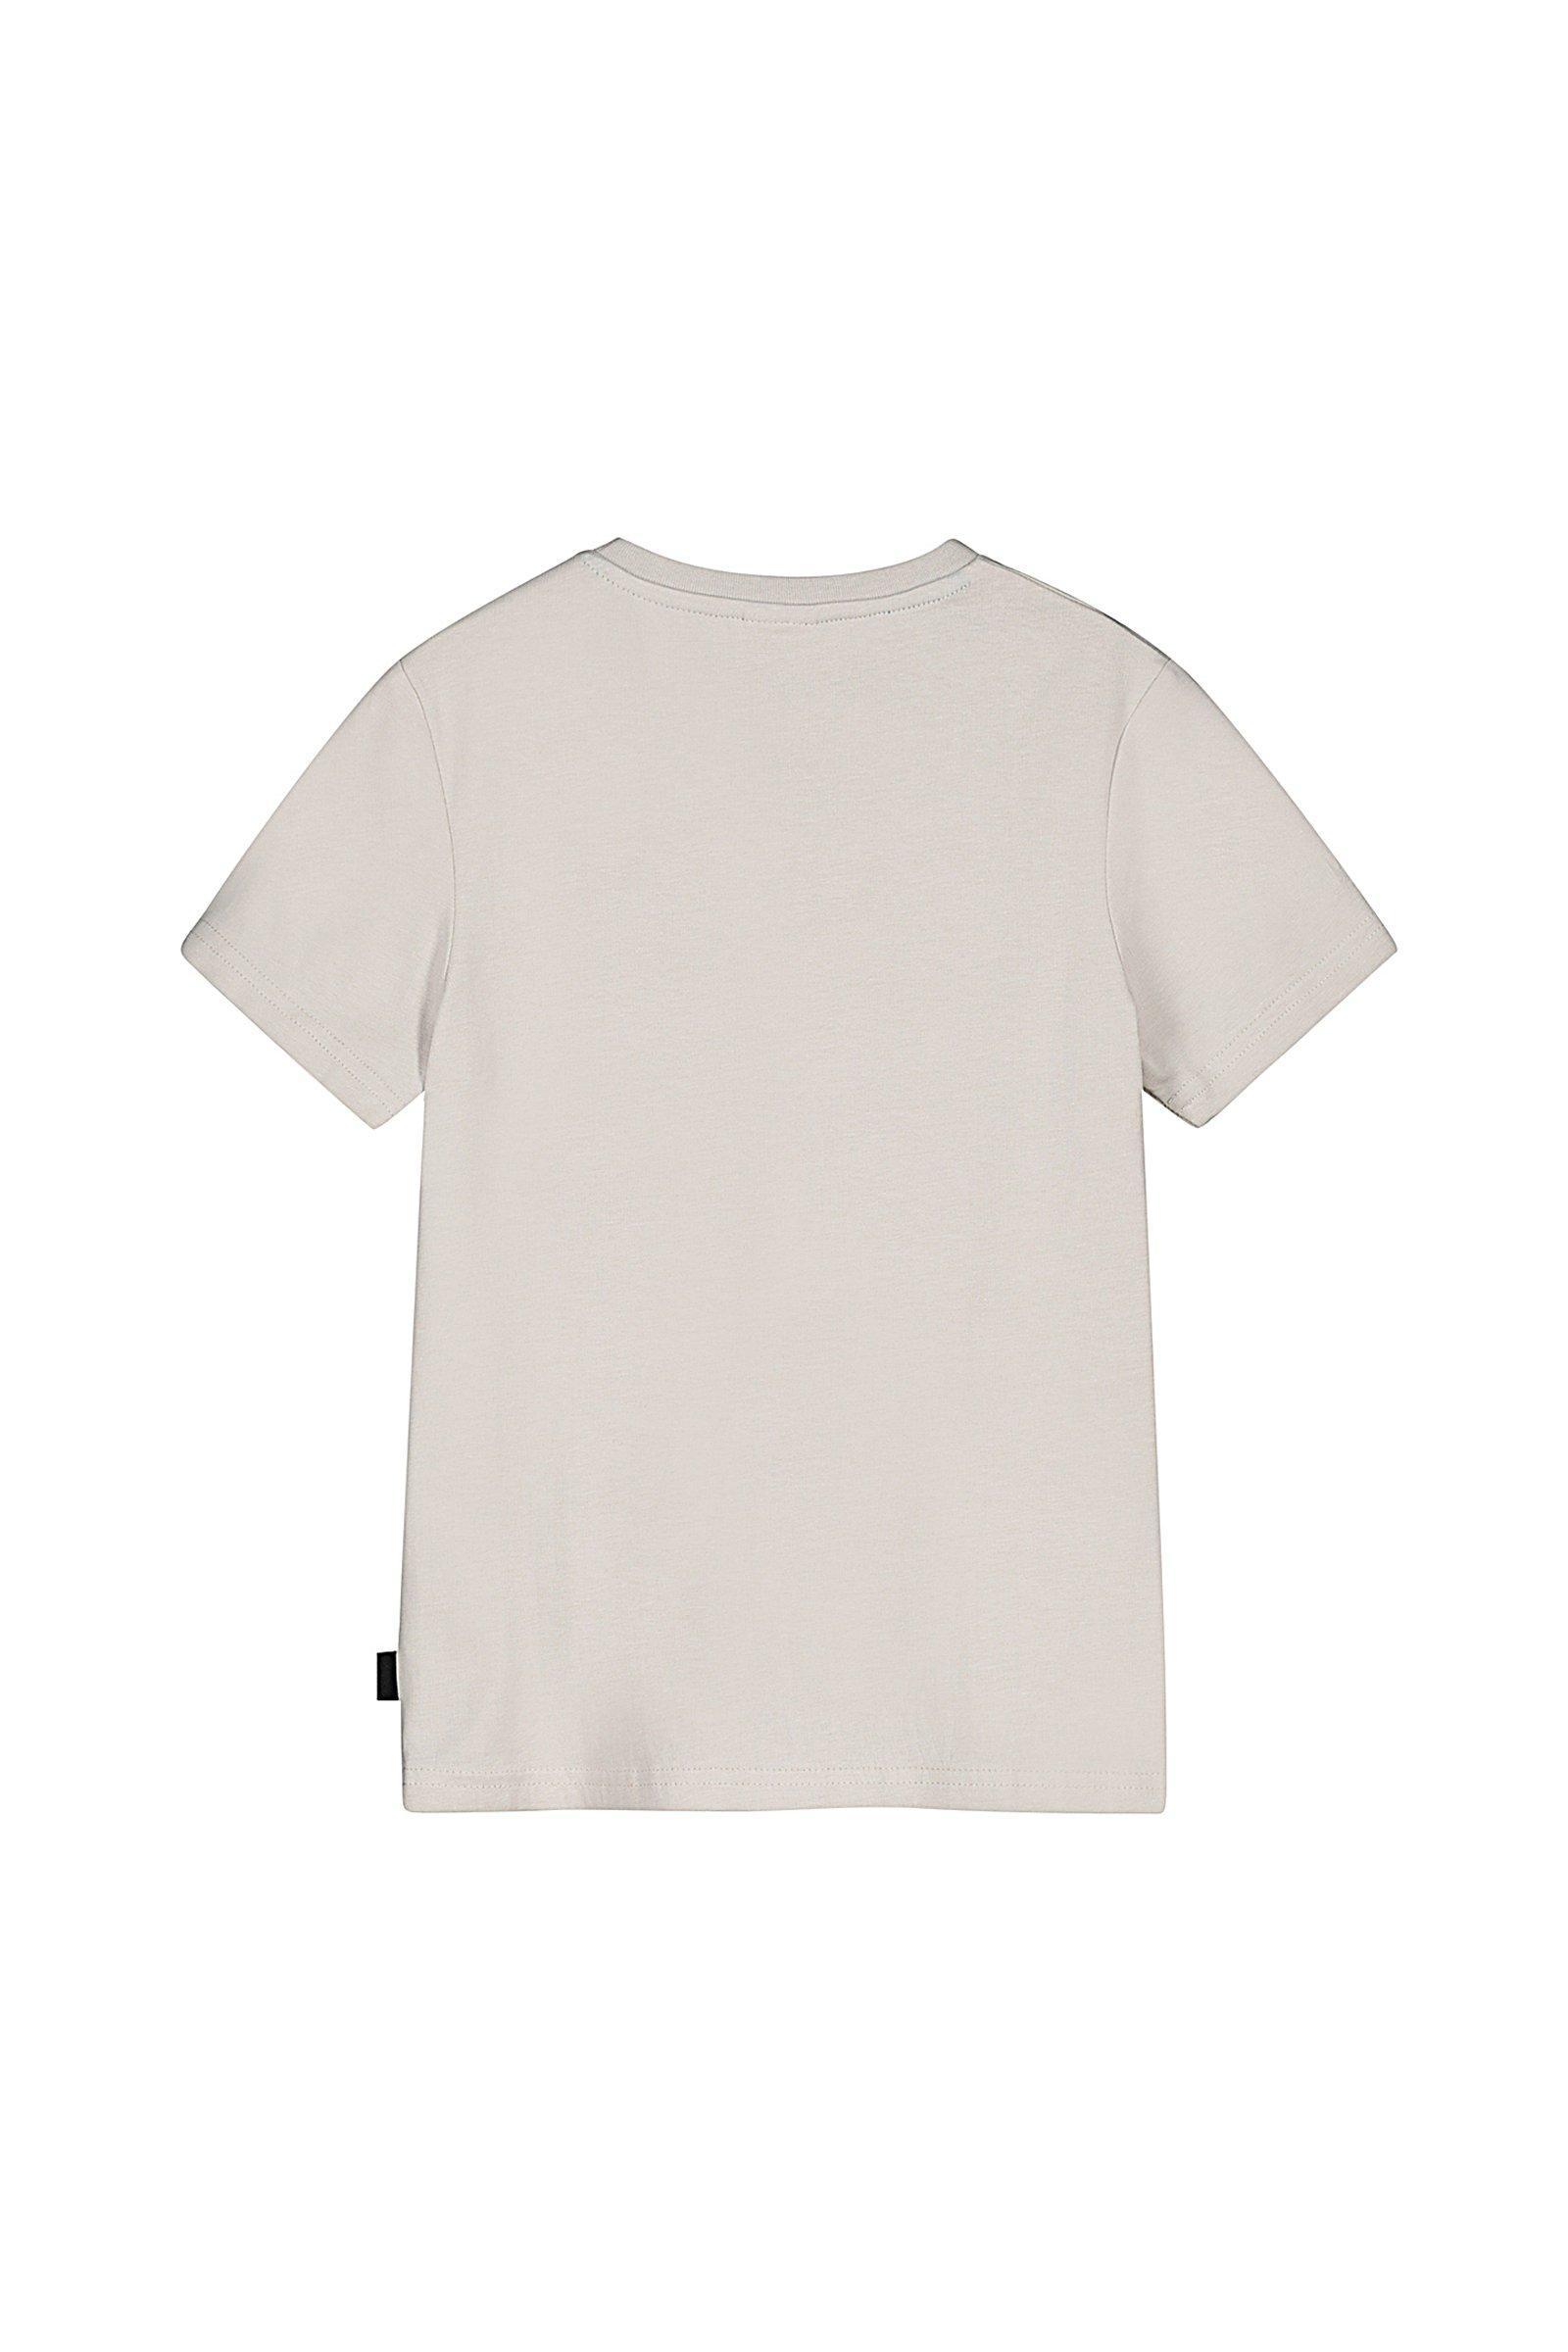 https://webmedia.cks-fashion.com/i/cks/123065BRL_100_h